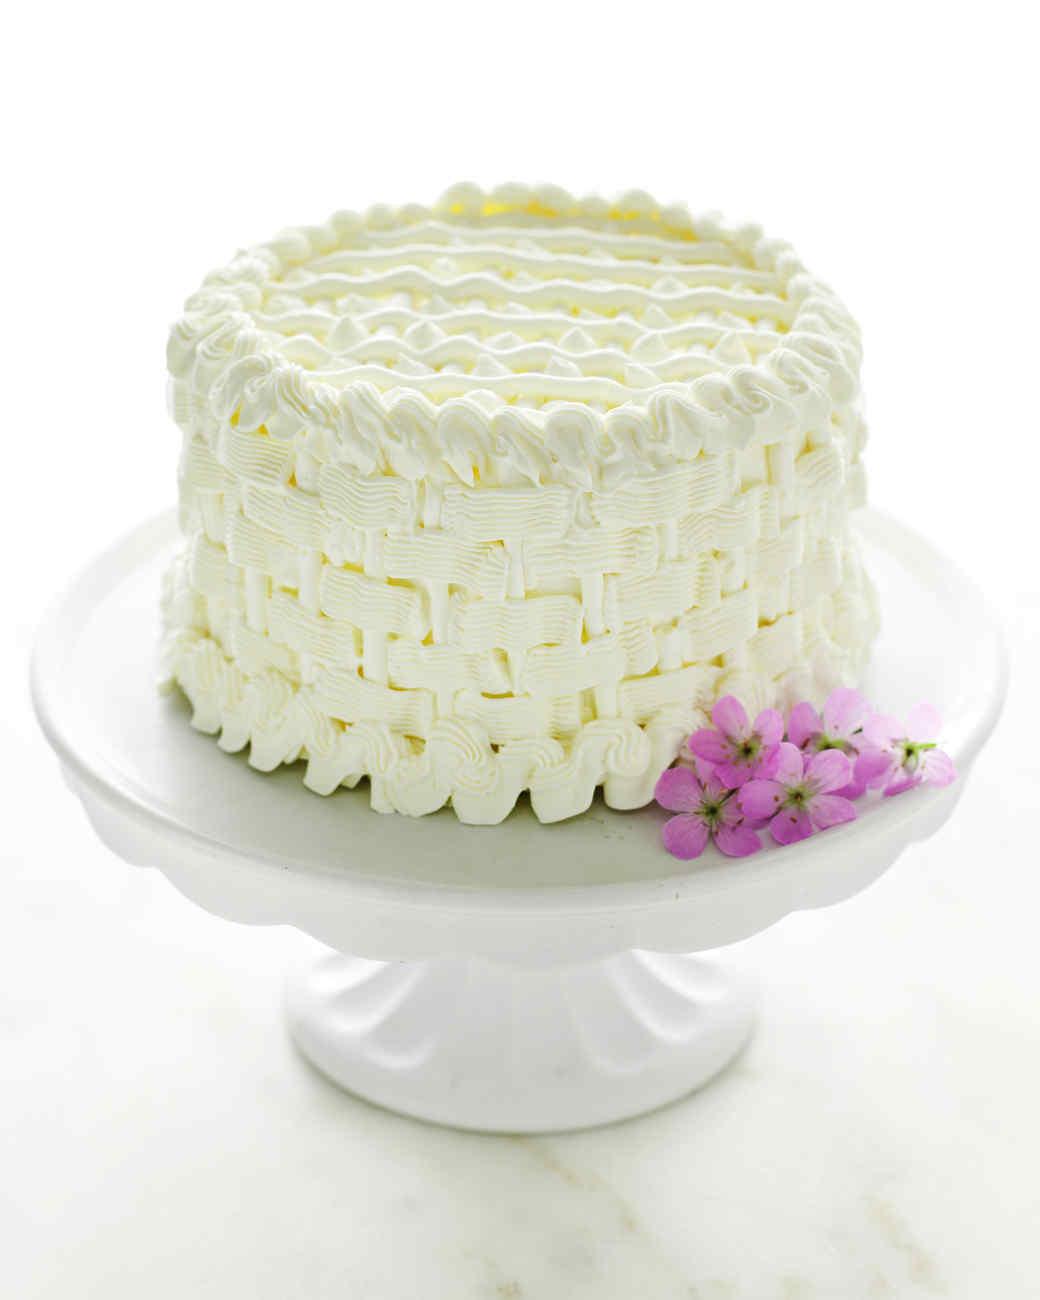 orange-almond-cake-mblb2011.jpg